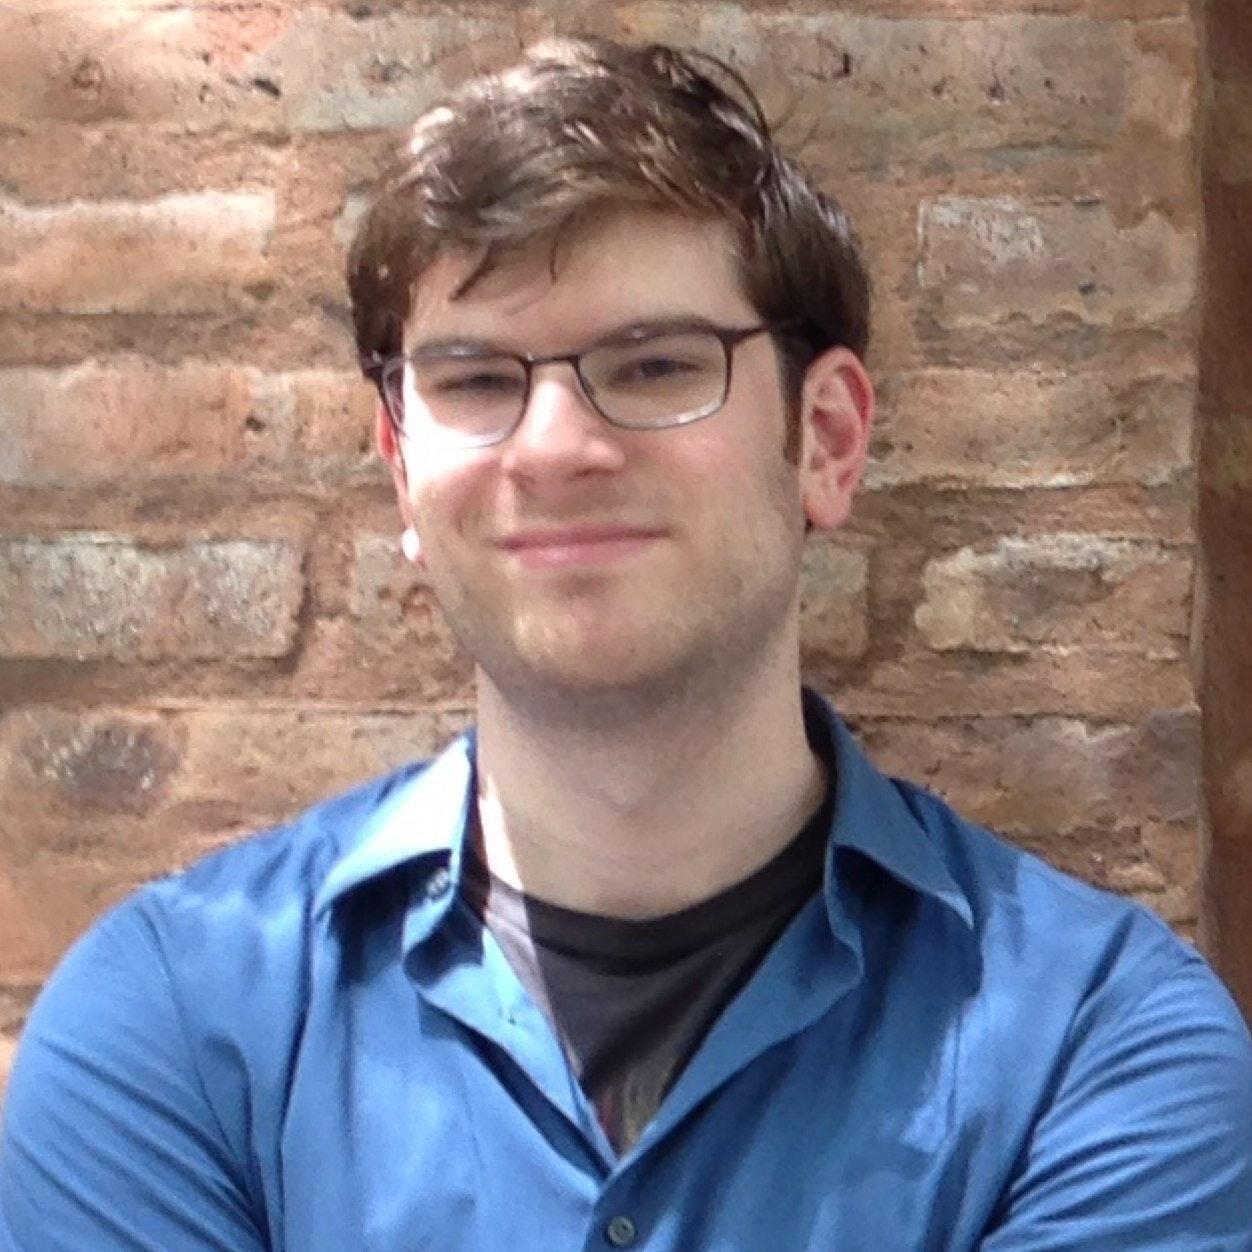 Seth Fiegerman